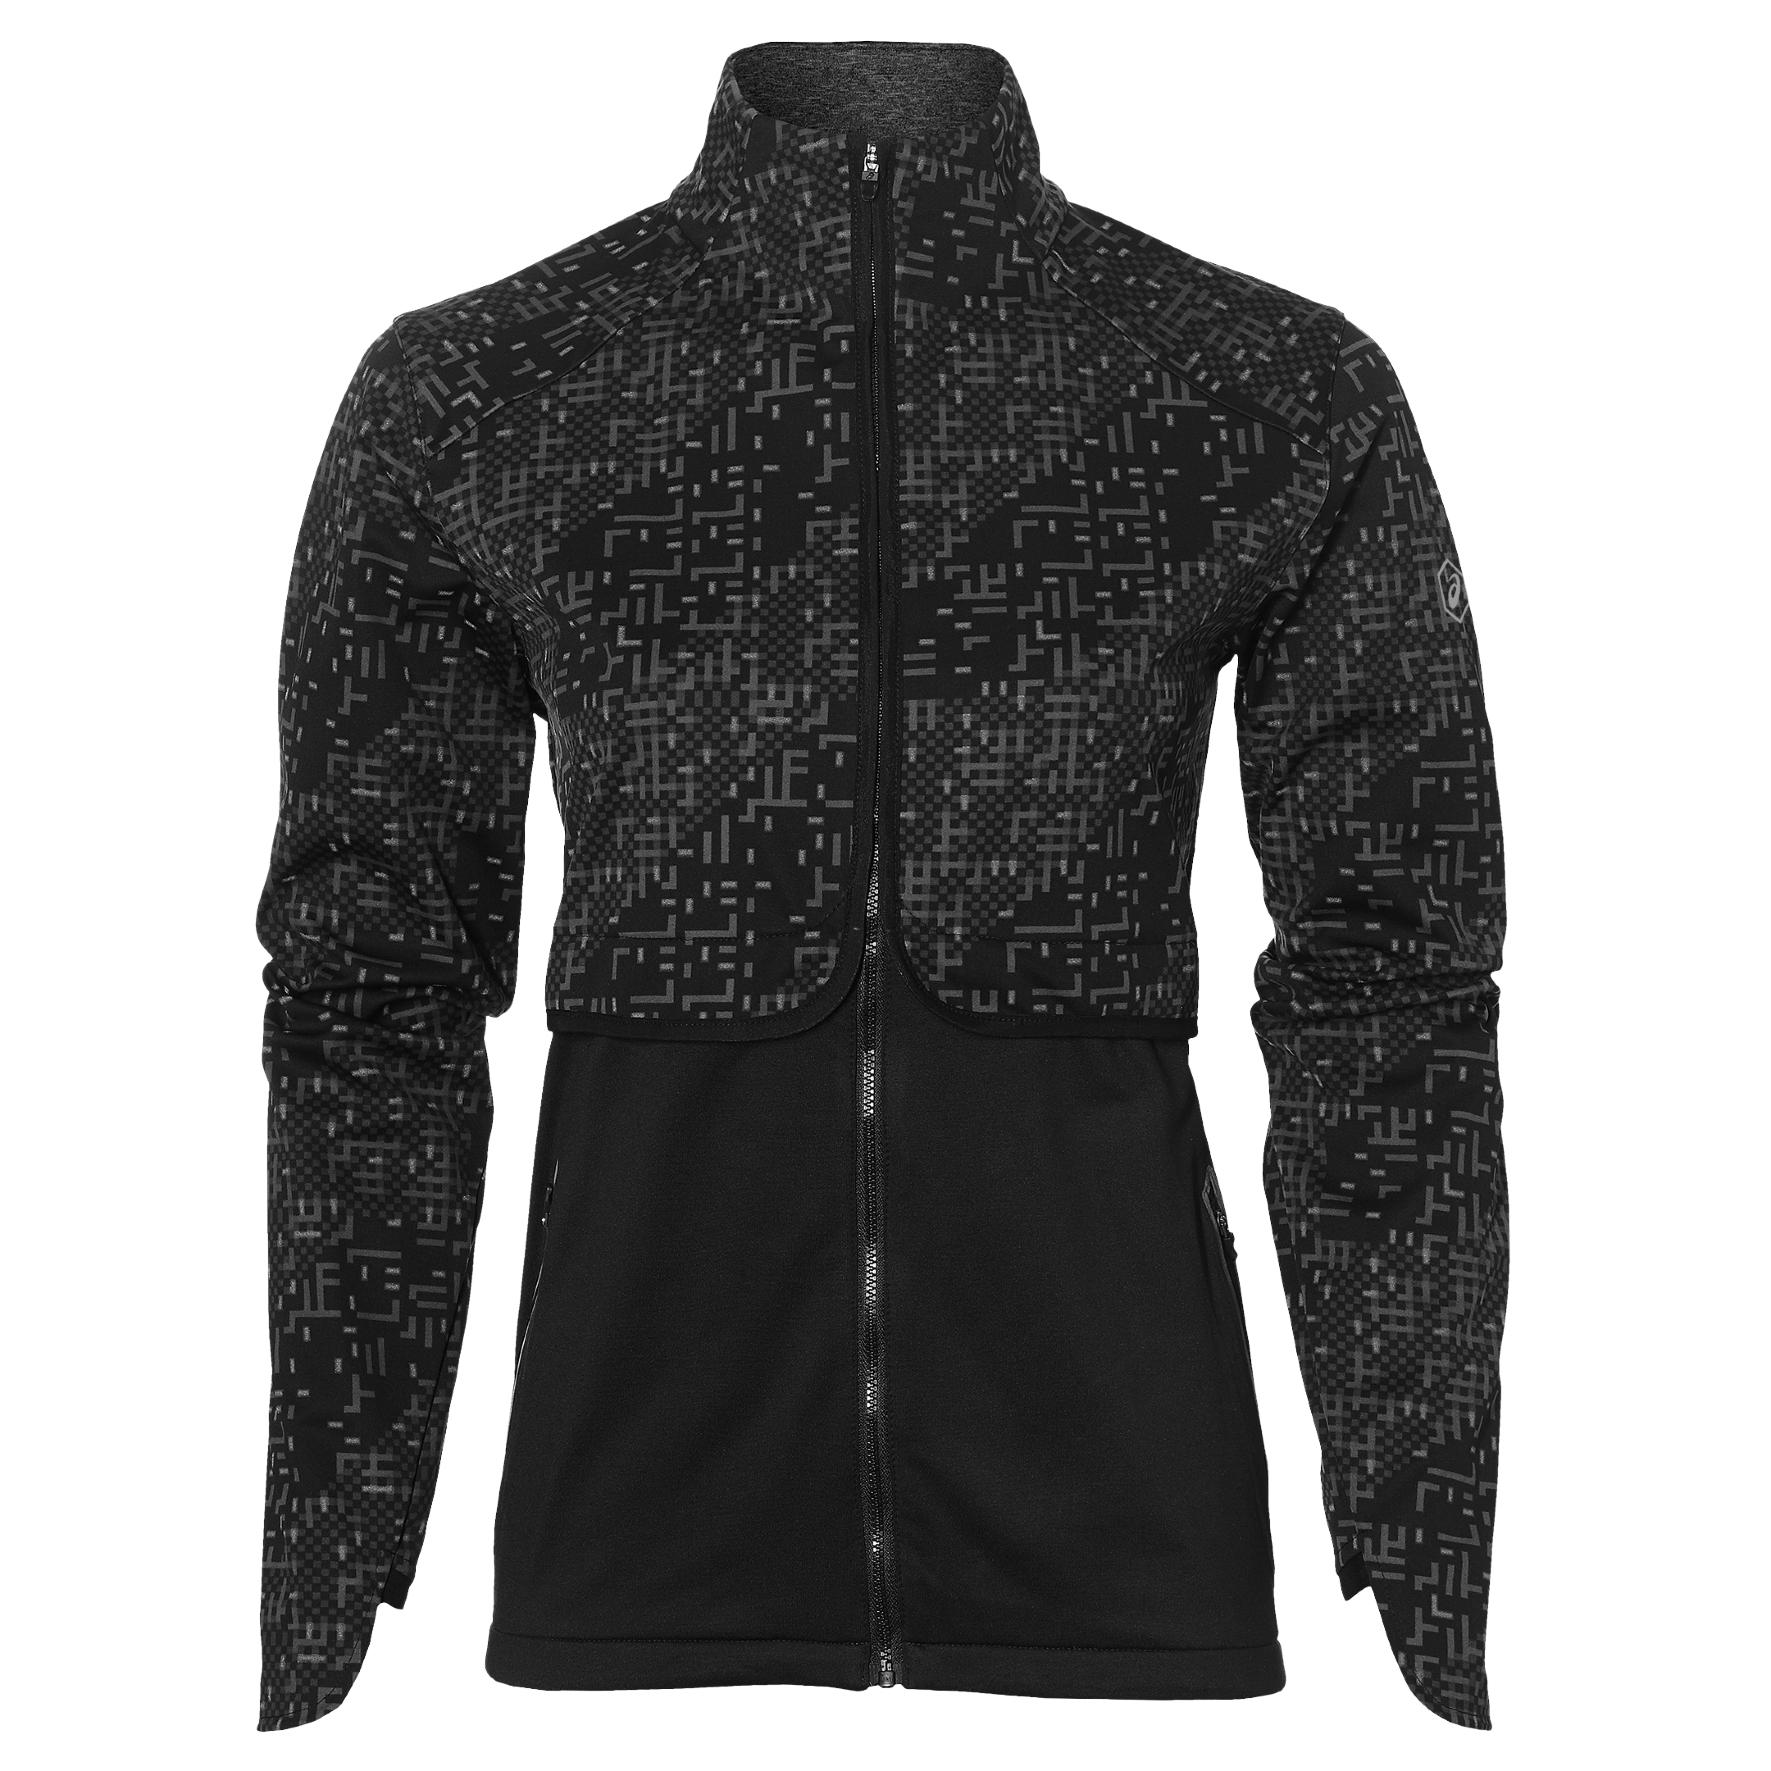 low priced f4049 935d7 Asics Lite-Show Winter Jacket Damen Laufjacke Running Jacke ...